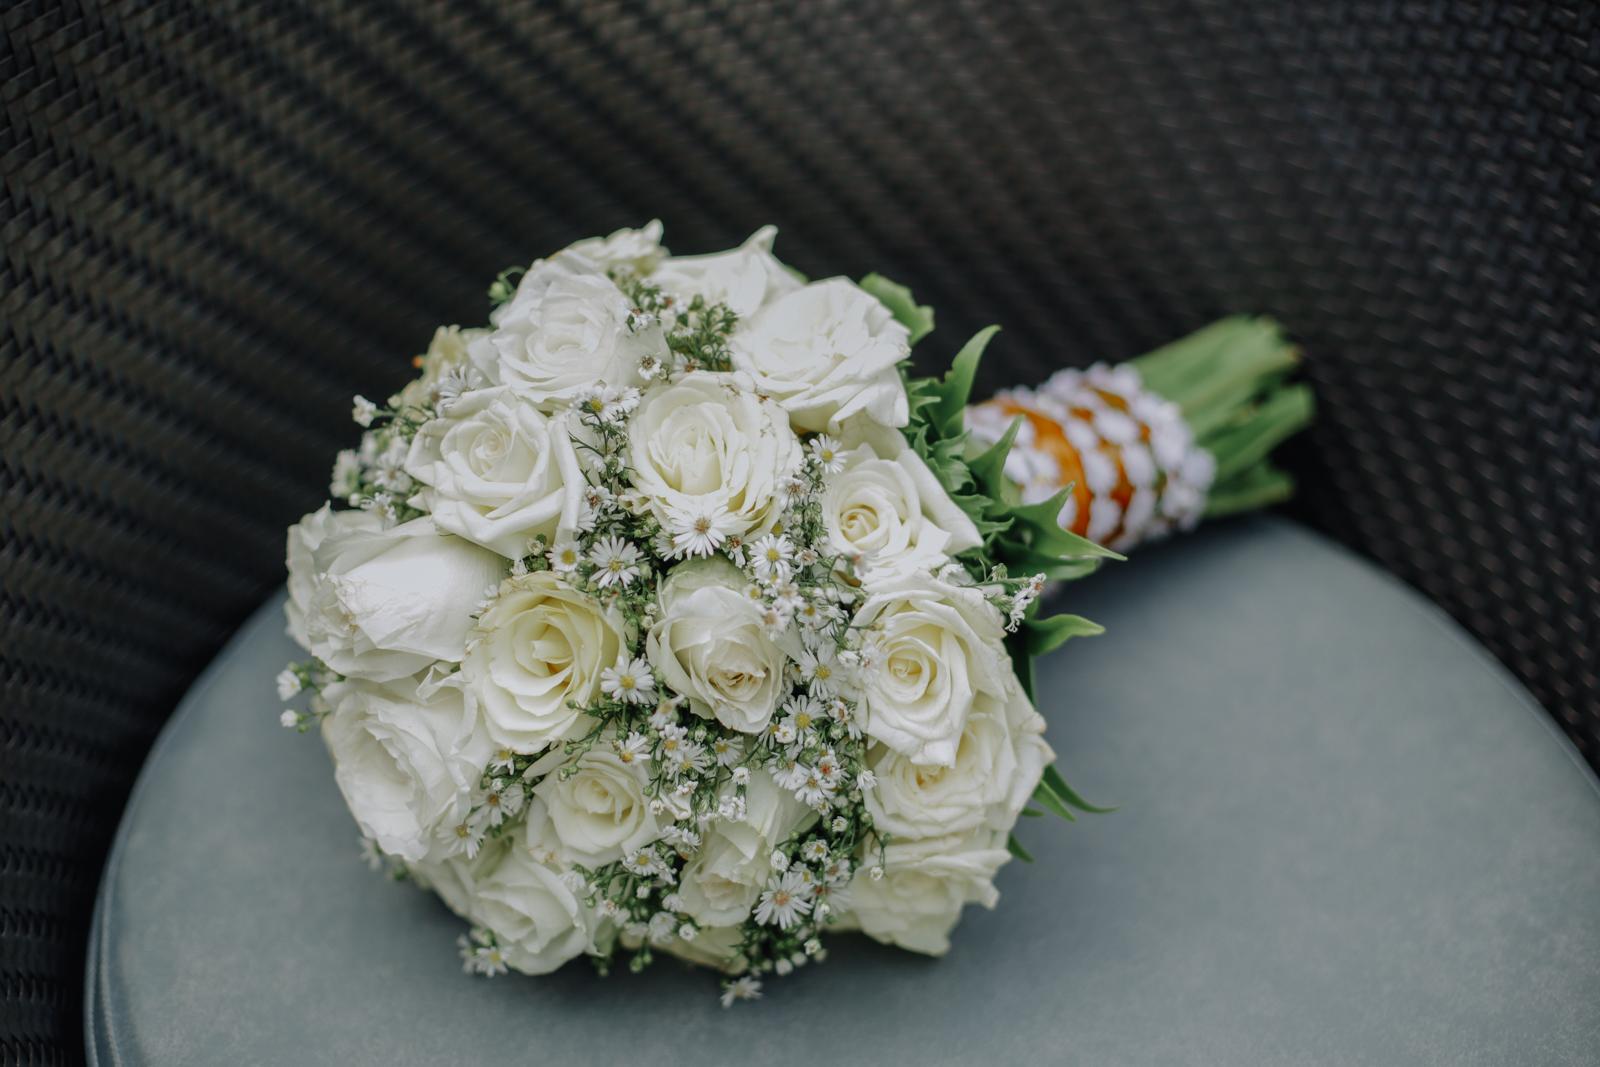 Maribago Bluewater Intimate Wedding